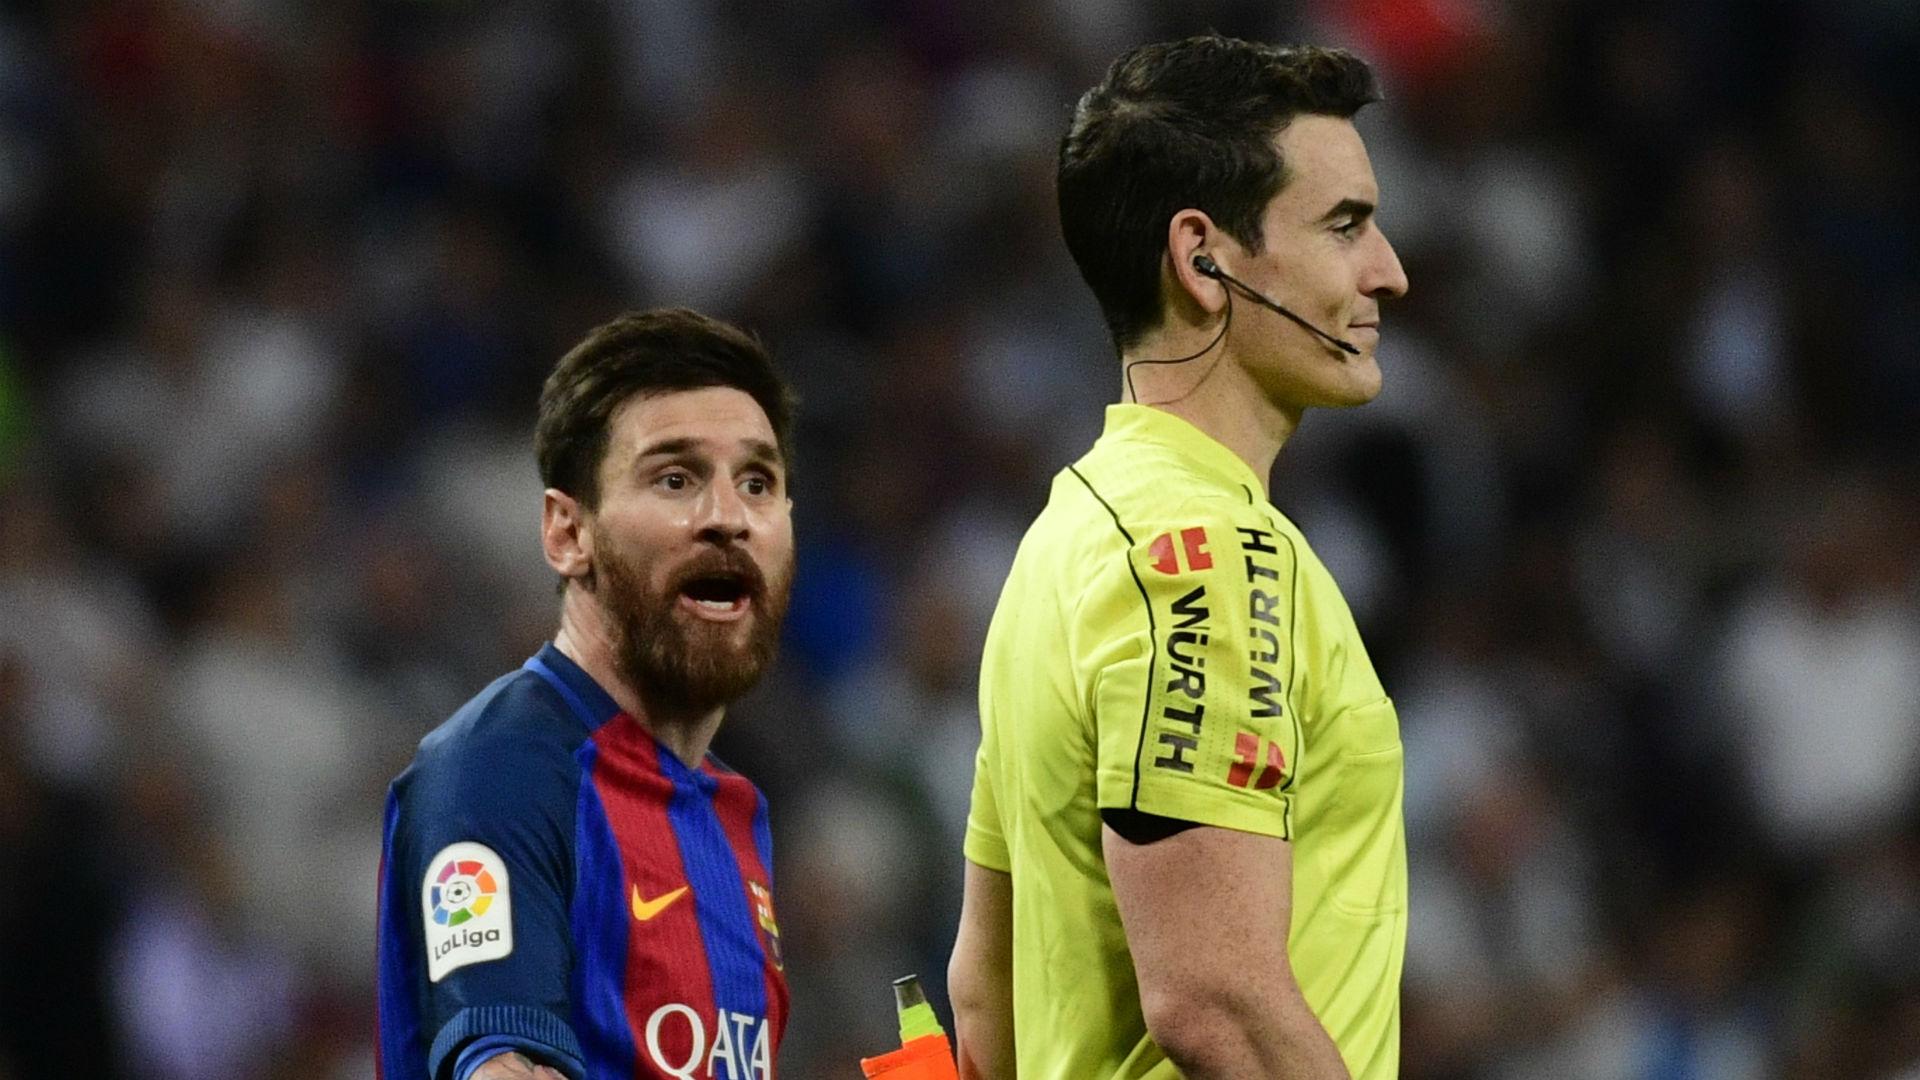 Barcelona se llevó un triunfo agónico del Bernabéu gracias a Messi